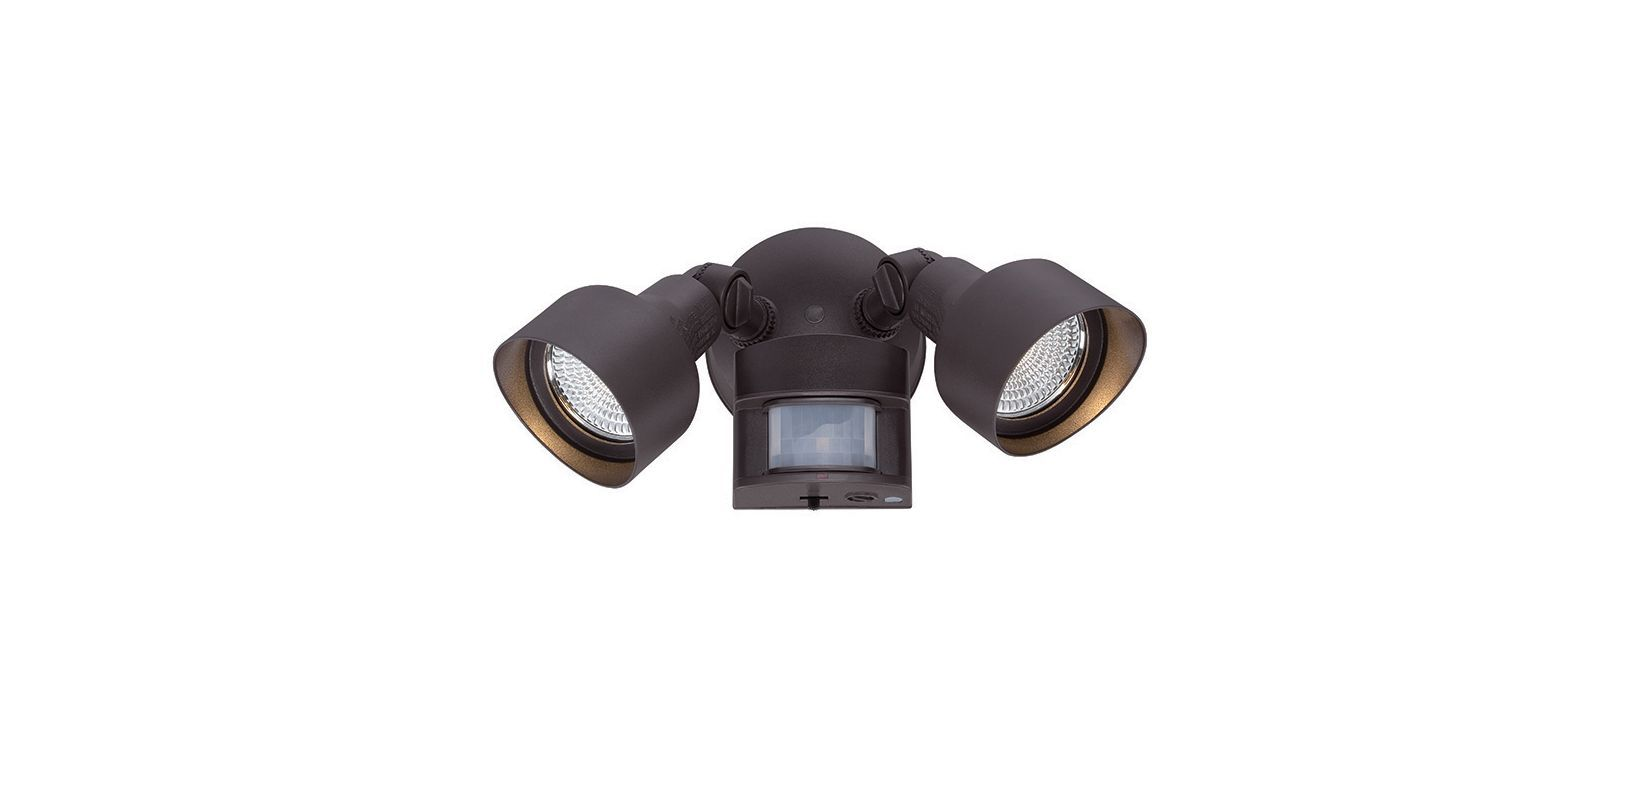 Acclaim lighting lflm dual head led flood light with motion sensor